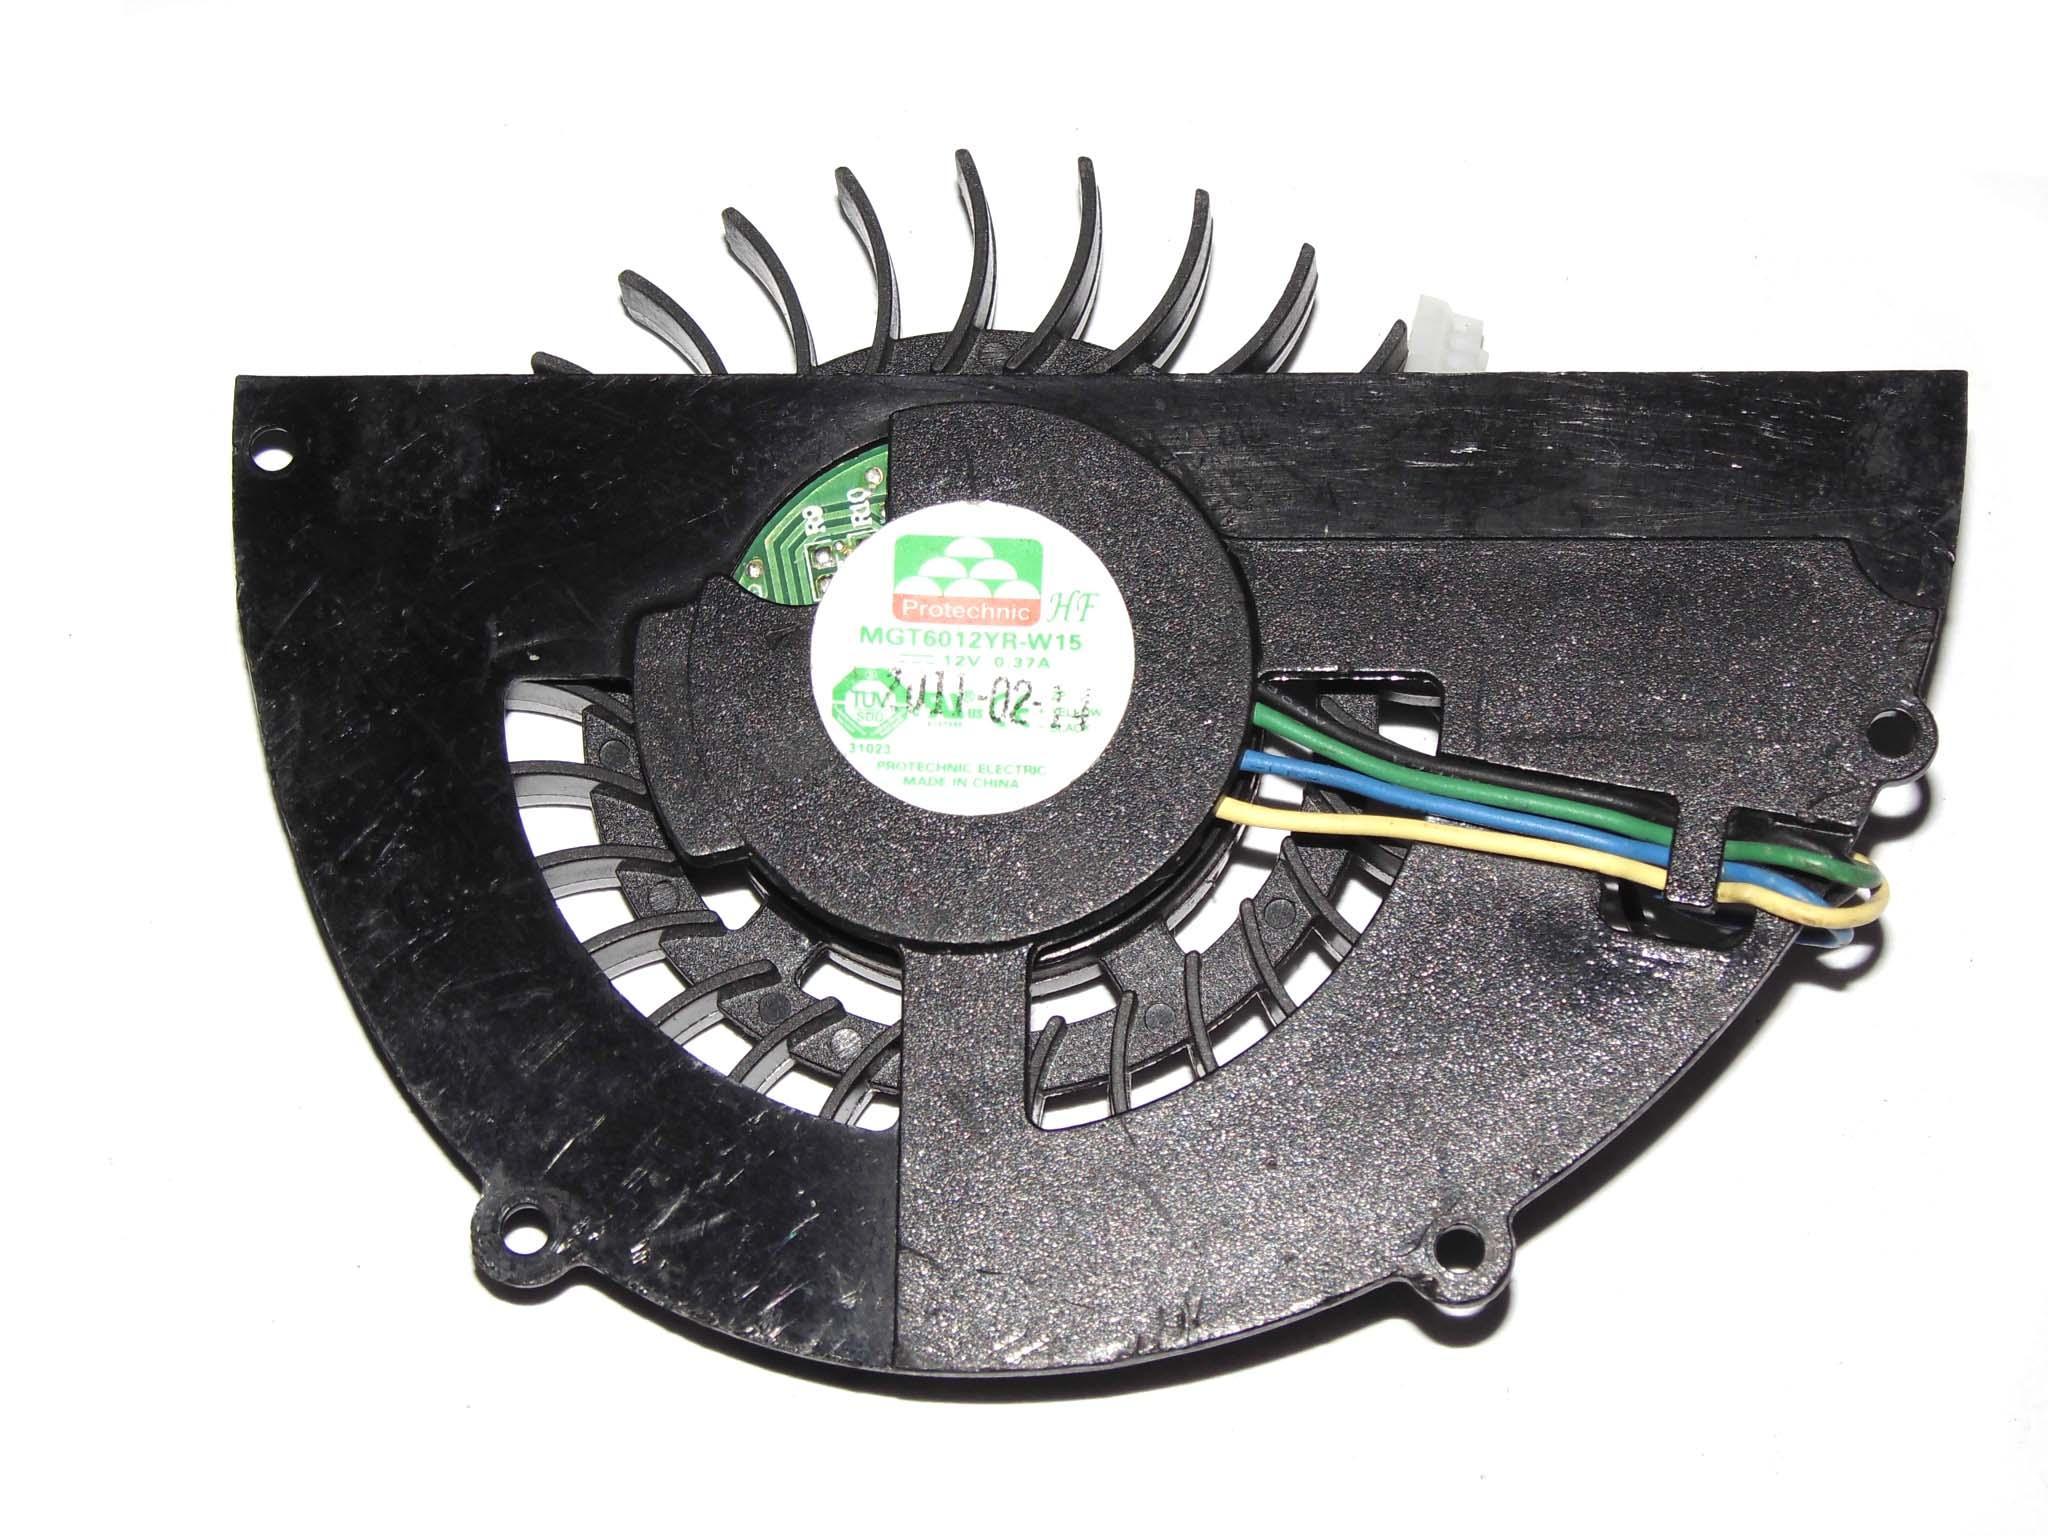 VGA 카드, 비디오 카드에 대한 MAGIC MGT6012YR-W15 12V 0.37A 4 와이어 4 핀 커넥터 냉각 팬